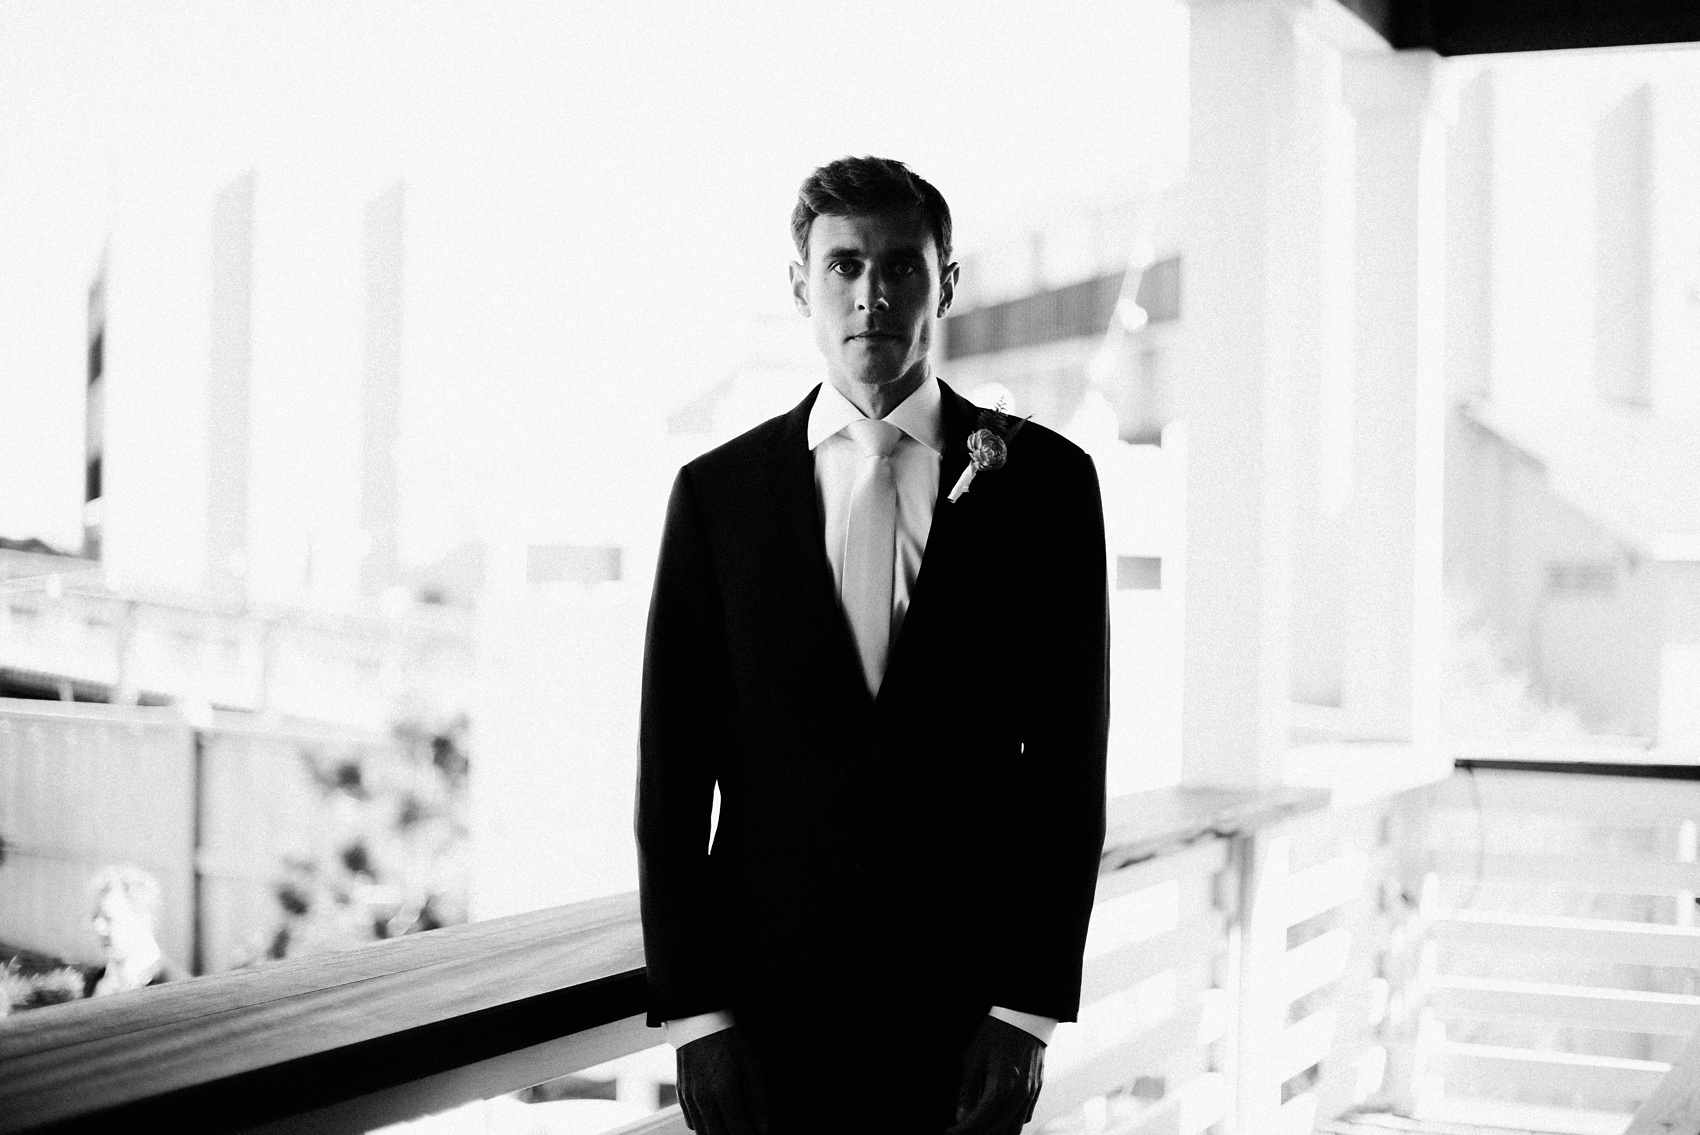 outerbanks_wedding_photographer_1243.jpg